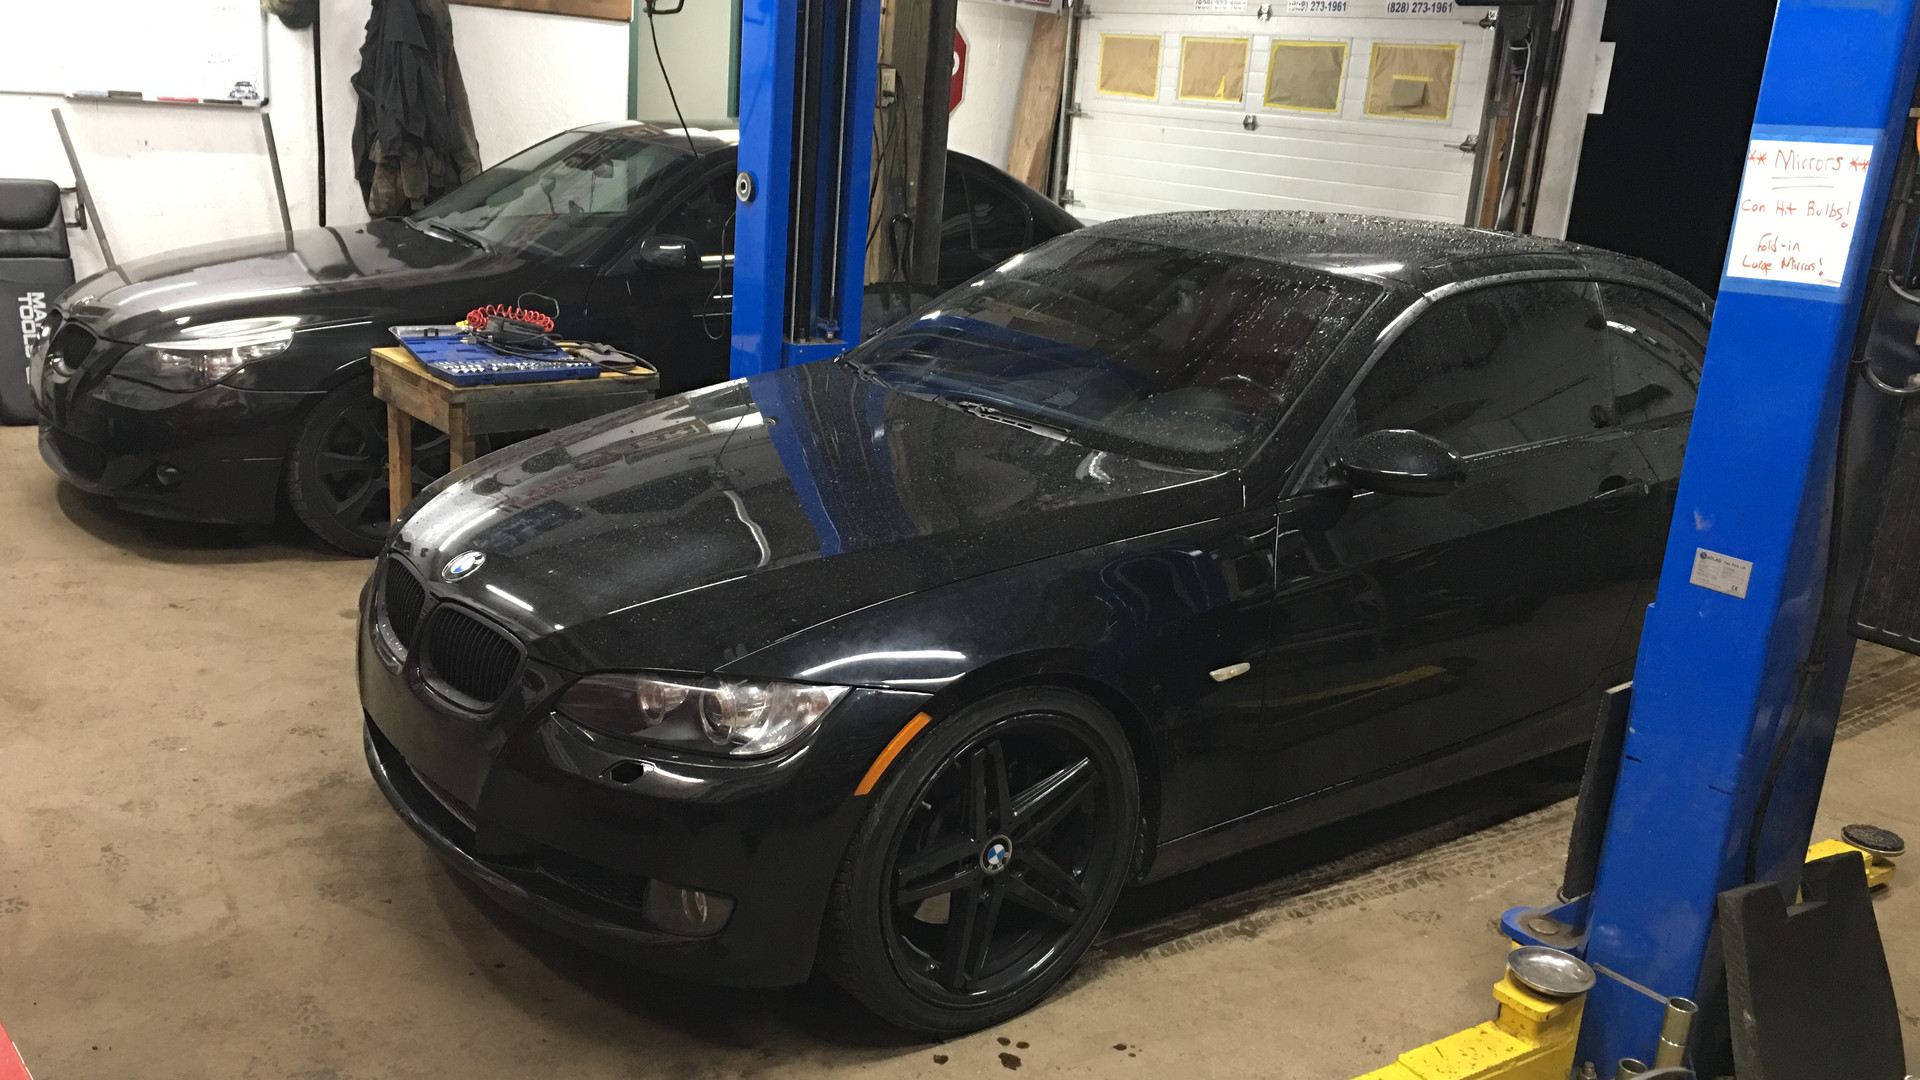 Black BMW cars in Empire Automotive